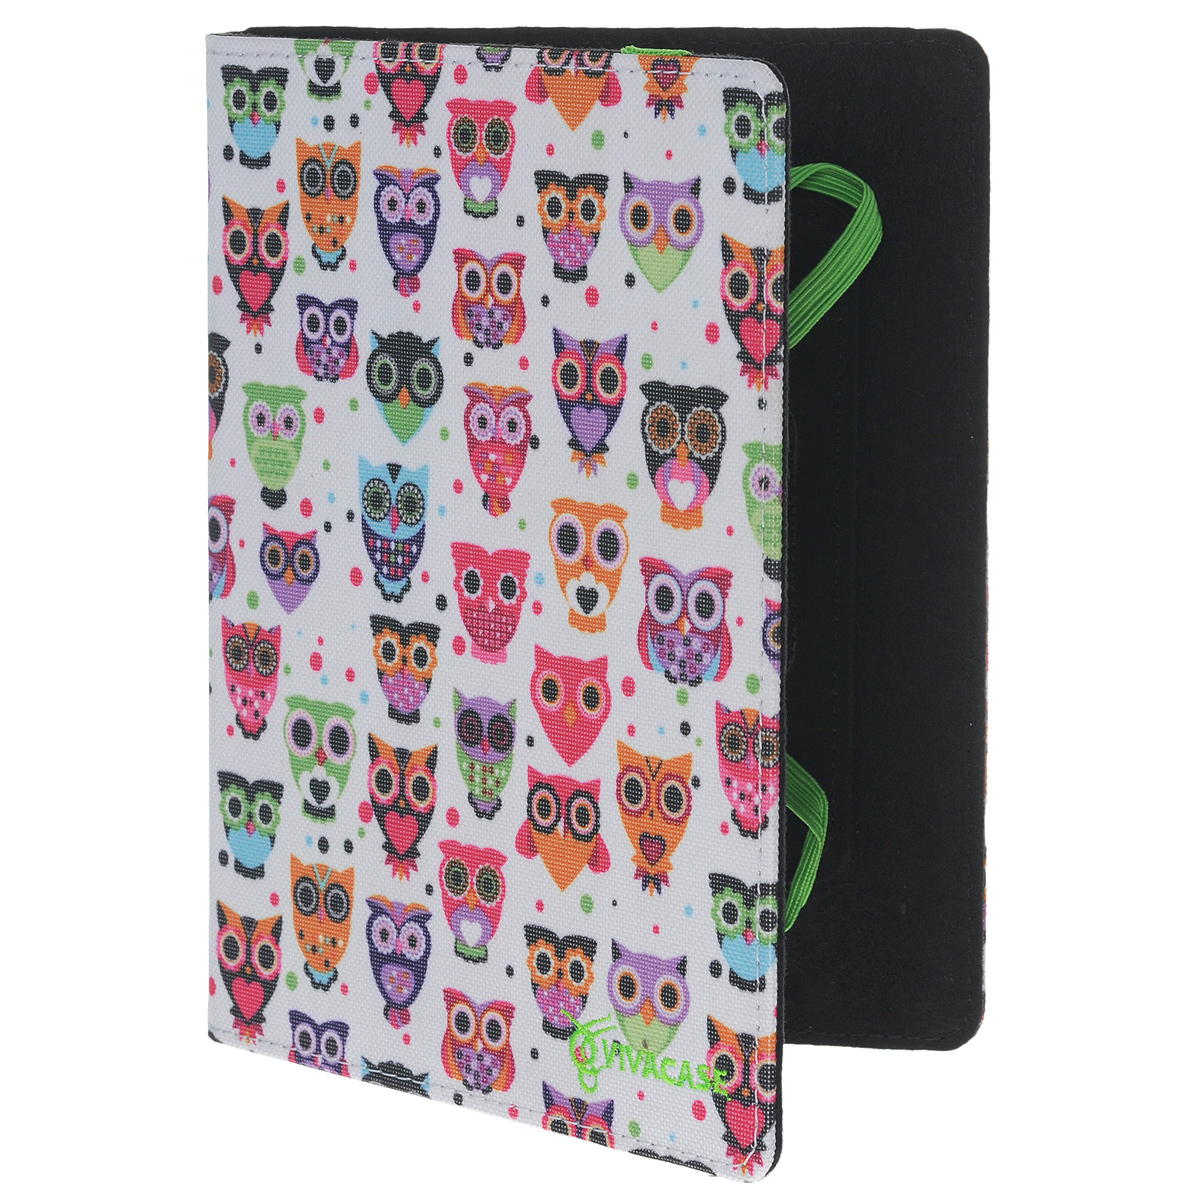 все цены на Vivacase Owl чехол для планшетов 8